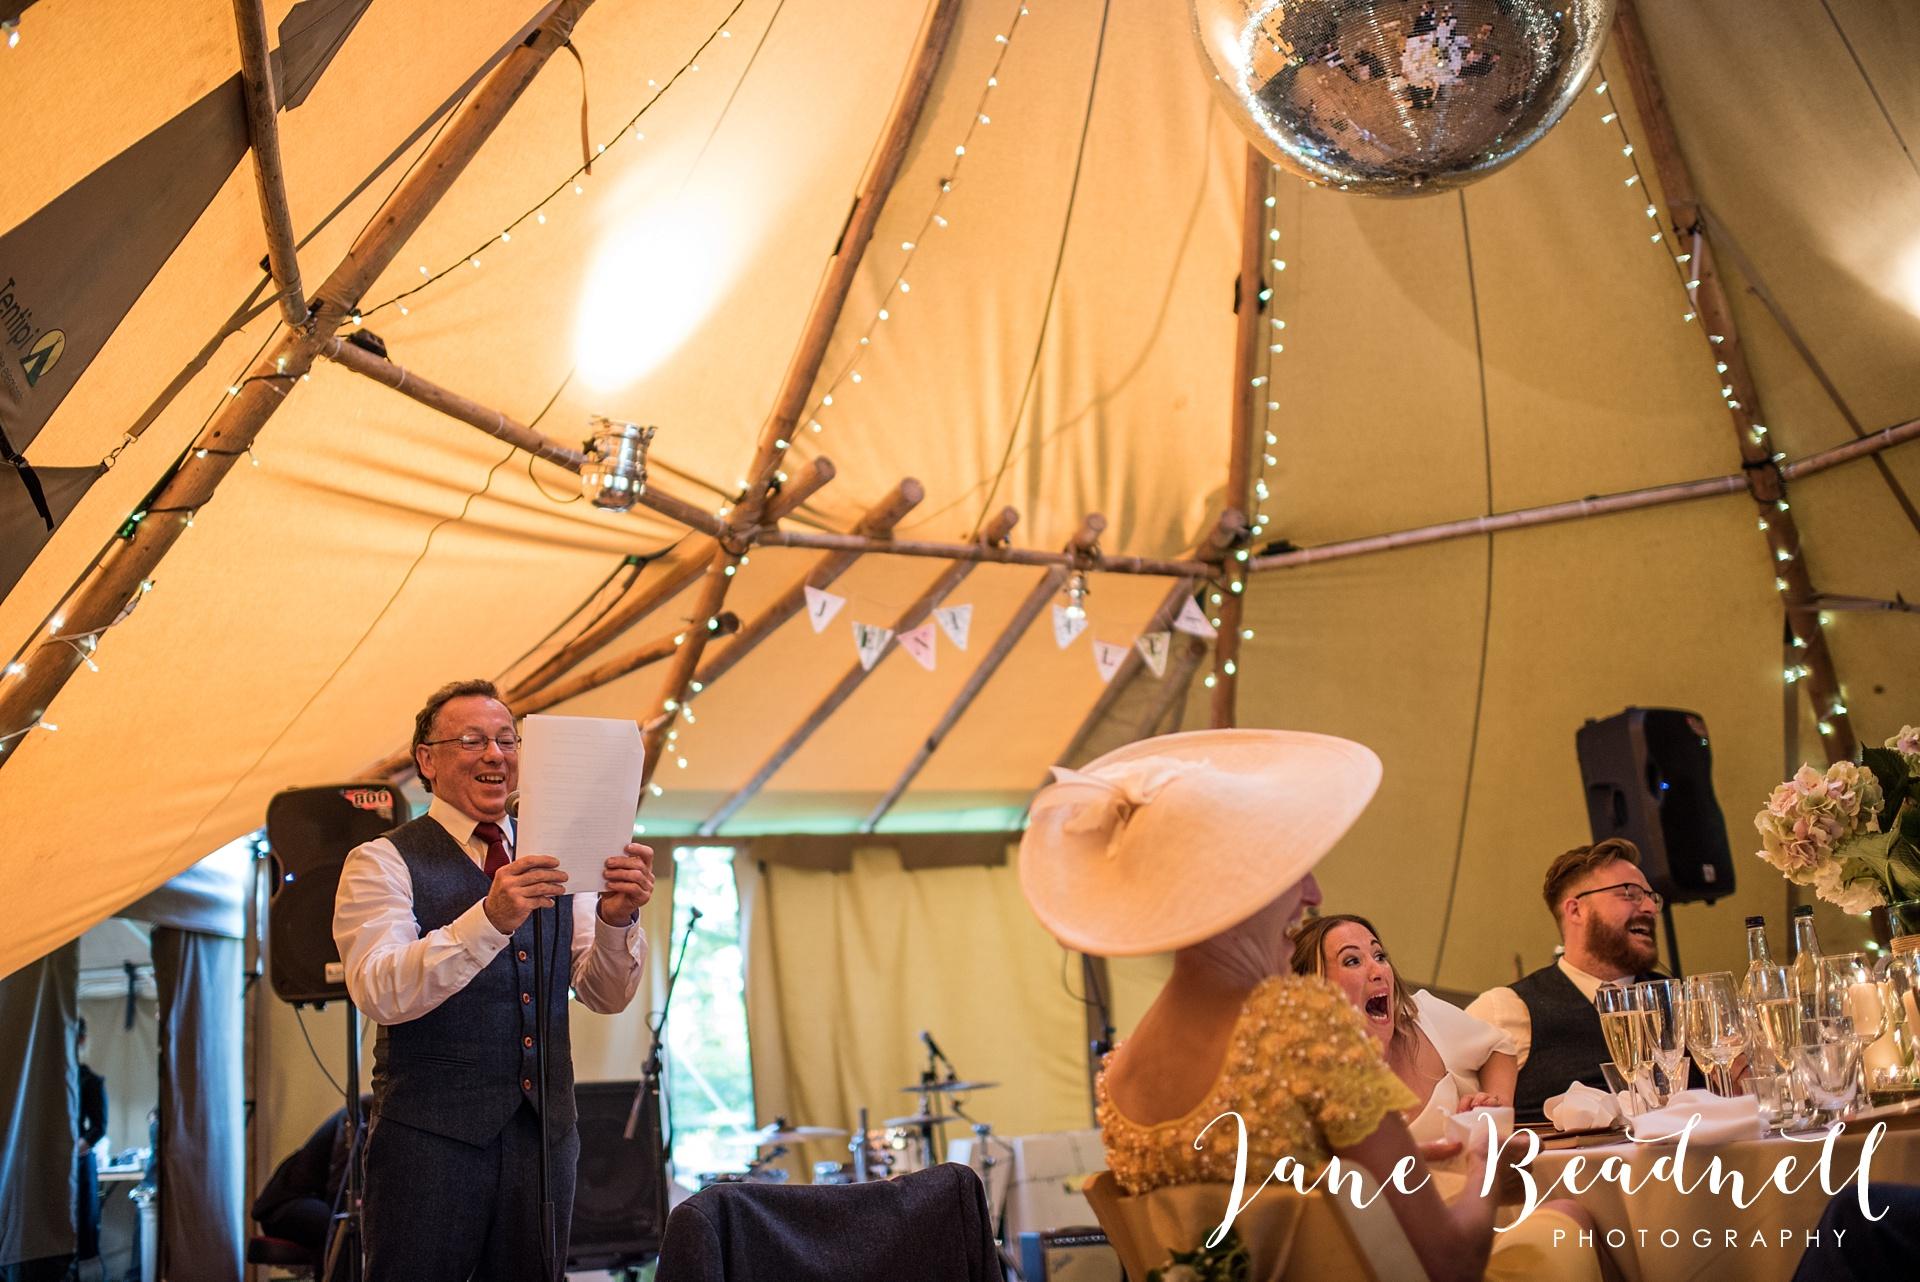 fine-art-wedding-photographer-jane-beadnell-yorkshire-wedding-photographer_0131